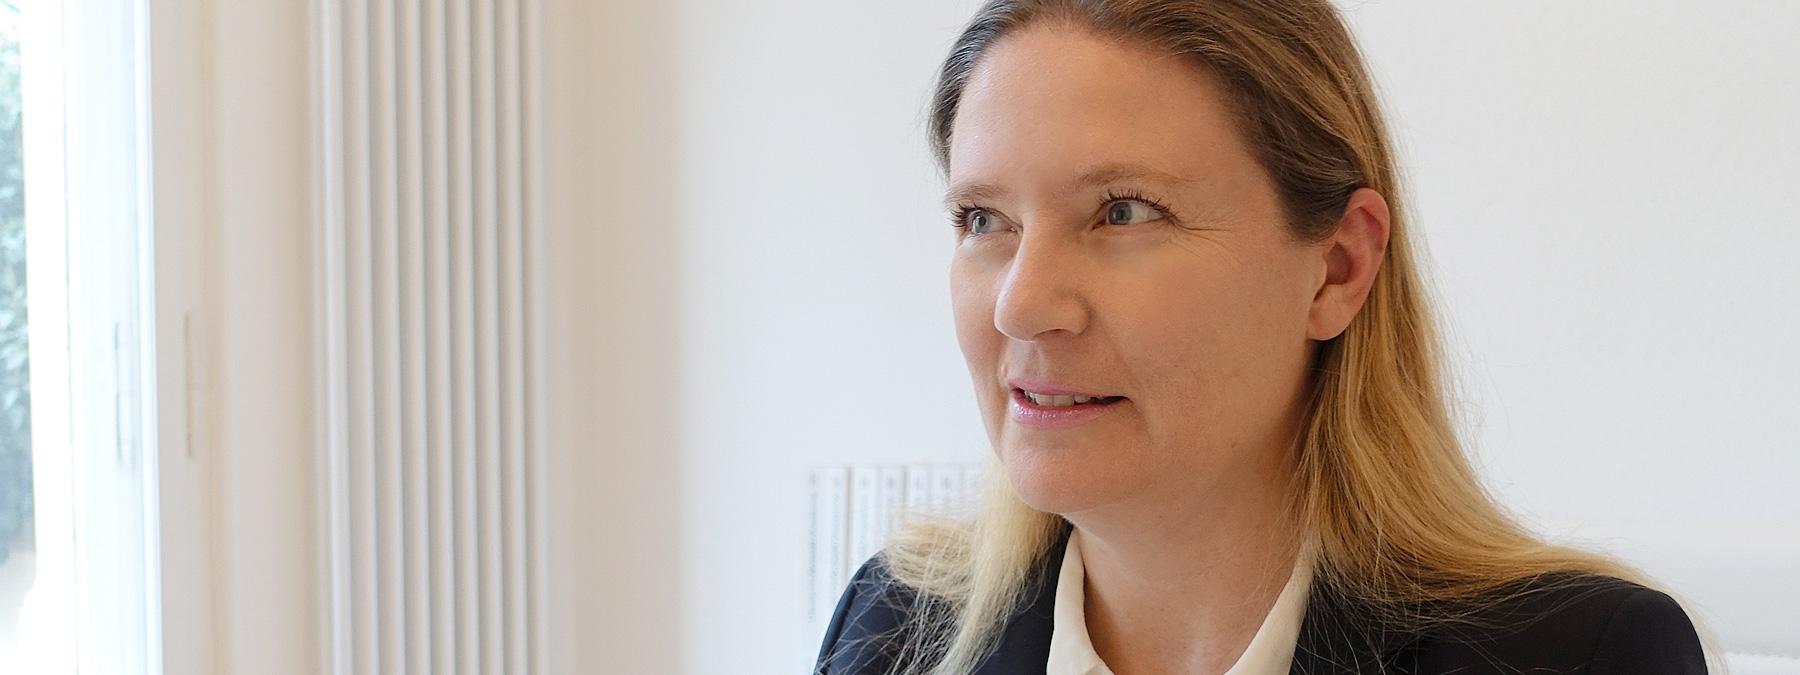 Anwalt Anwältin Potsdam Anwaltskanzlei Bewertungsportale